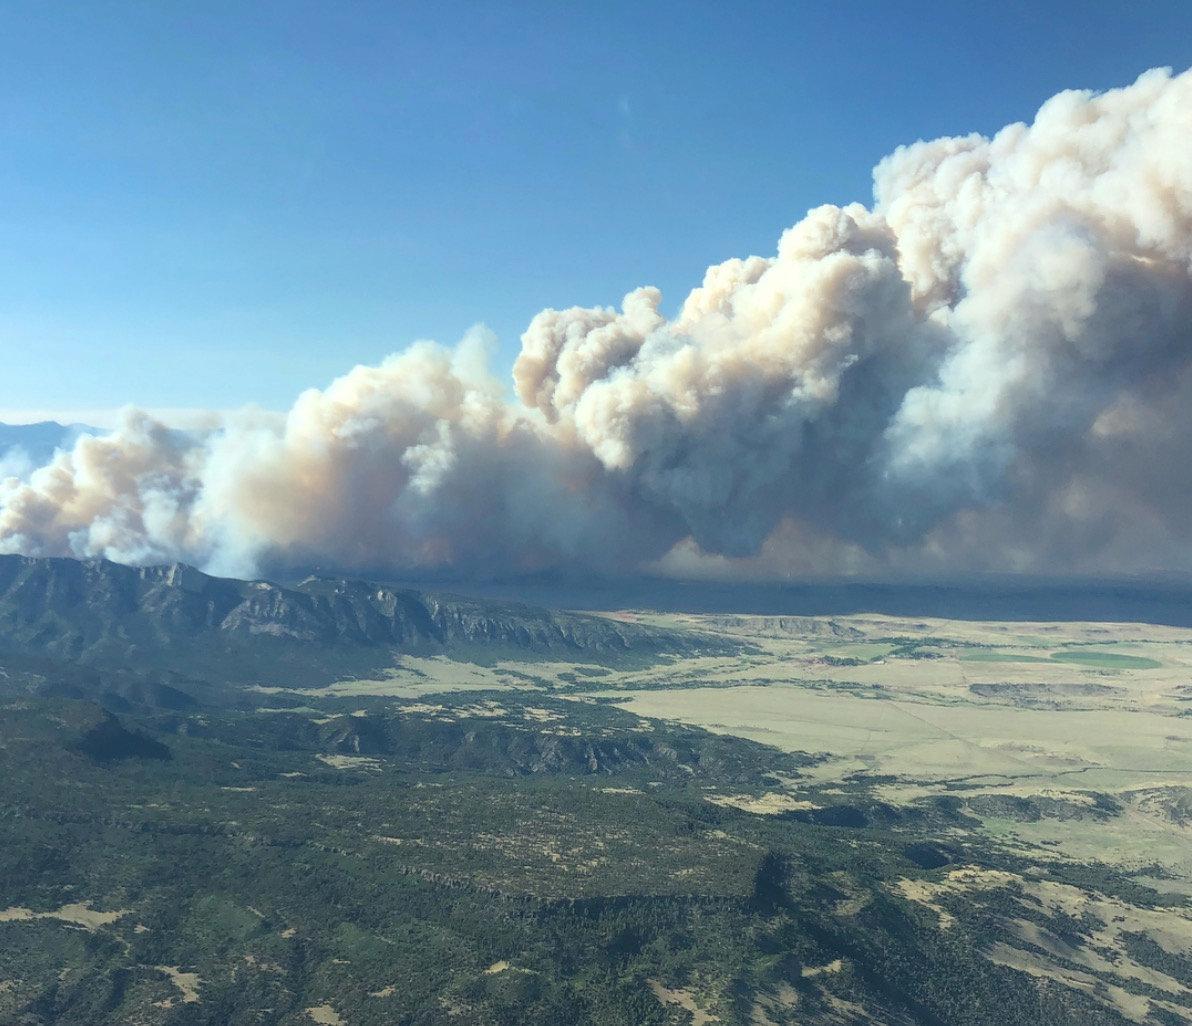 New Mexico, Colorado wildfires force hundreds to evacuate - Reuters